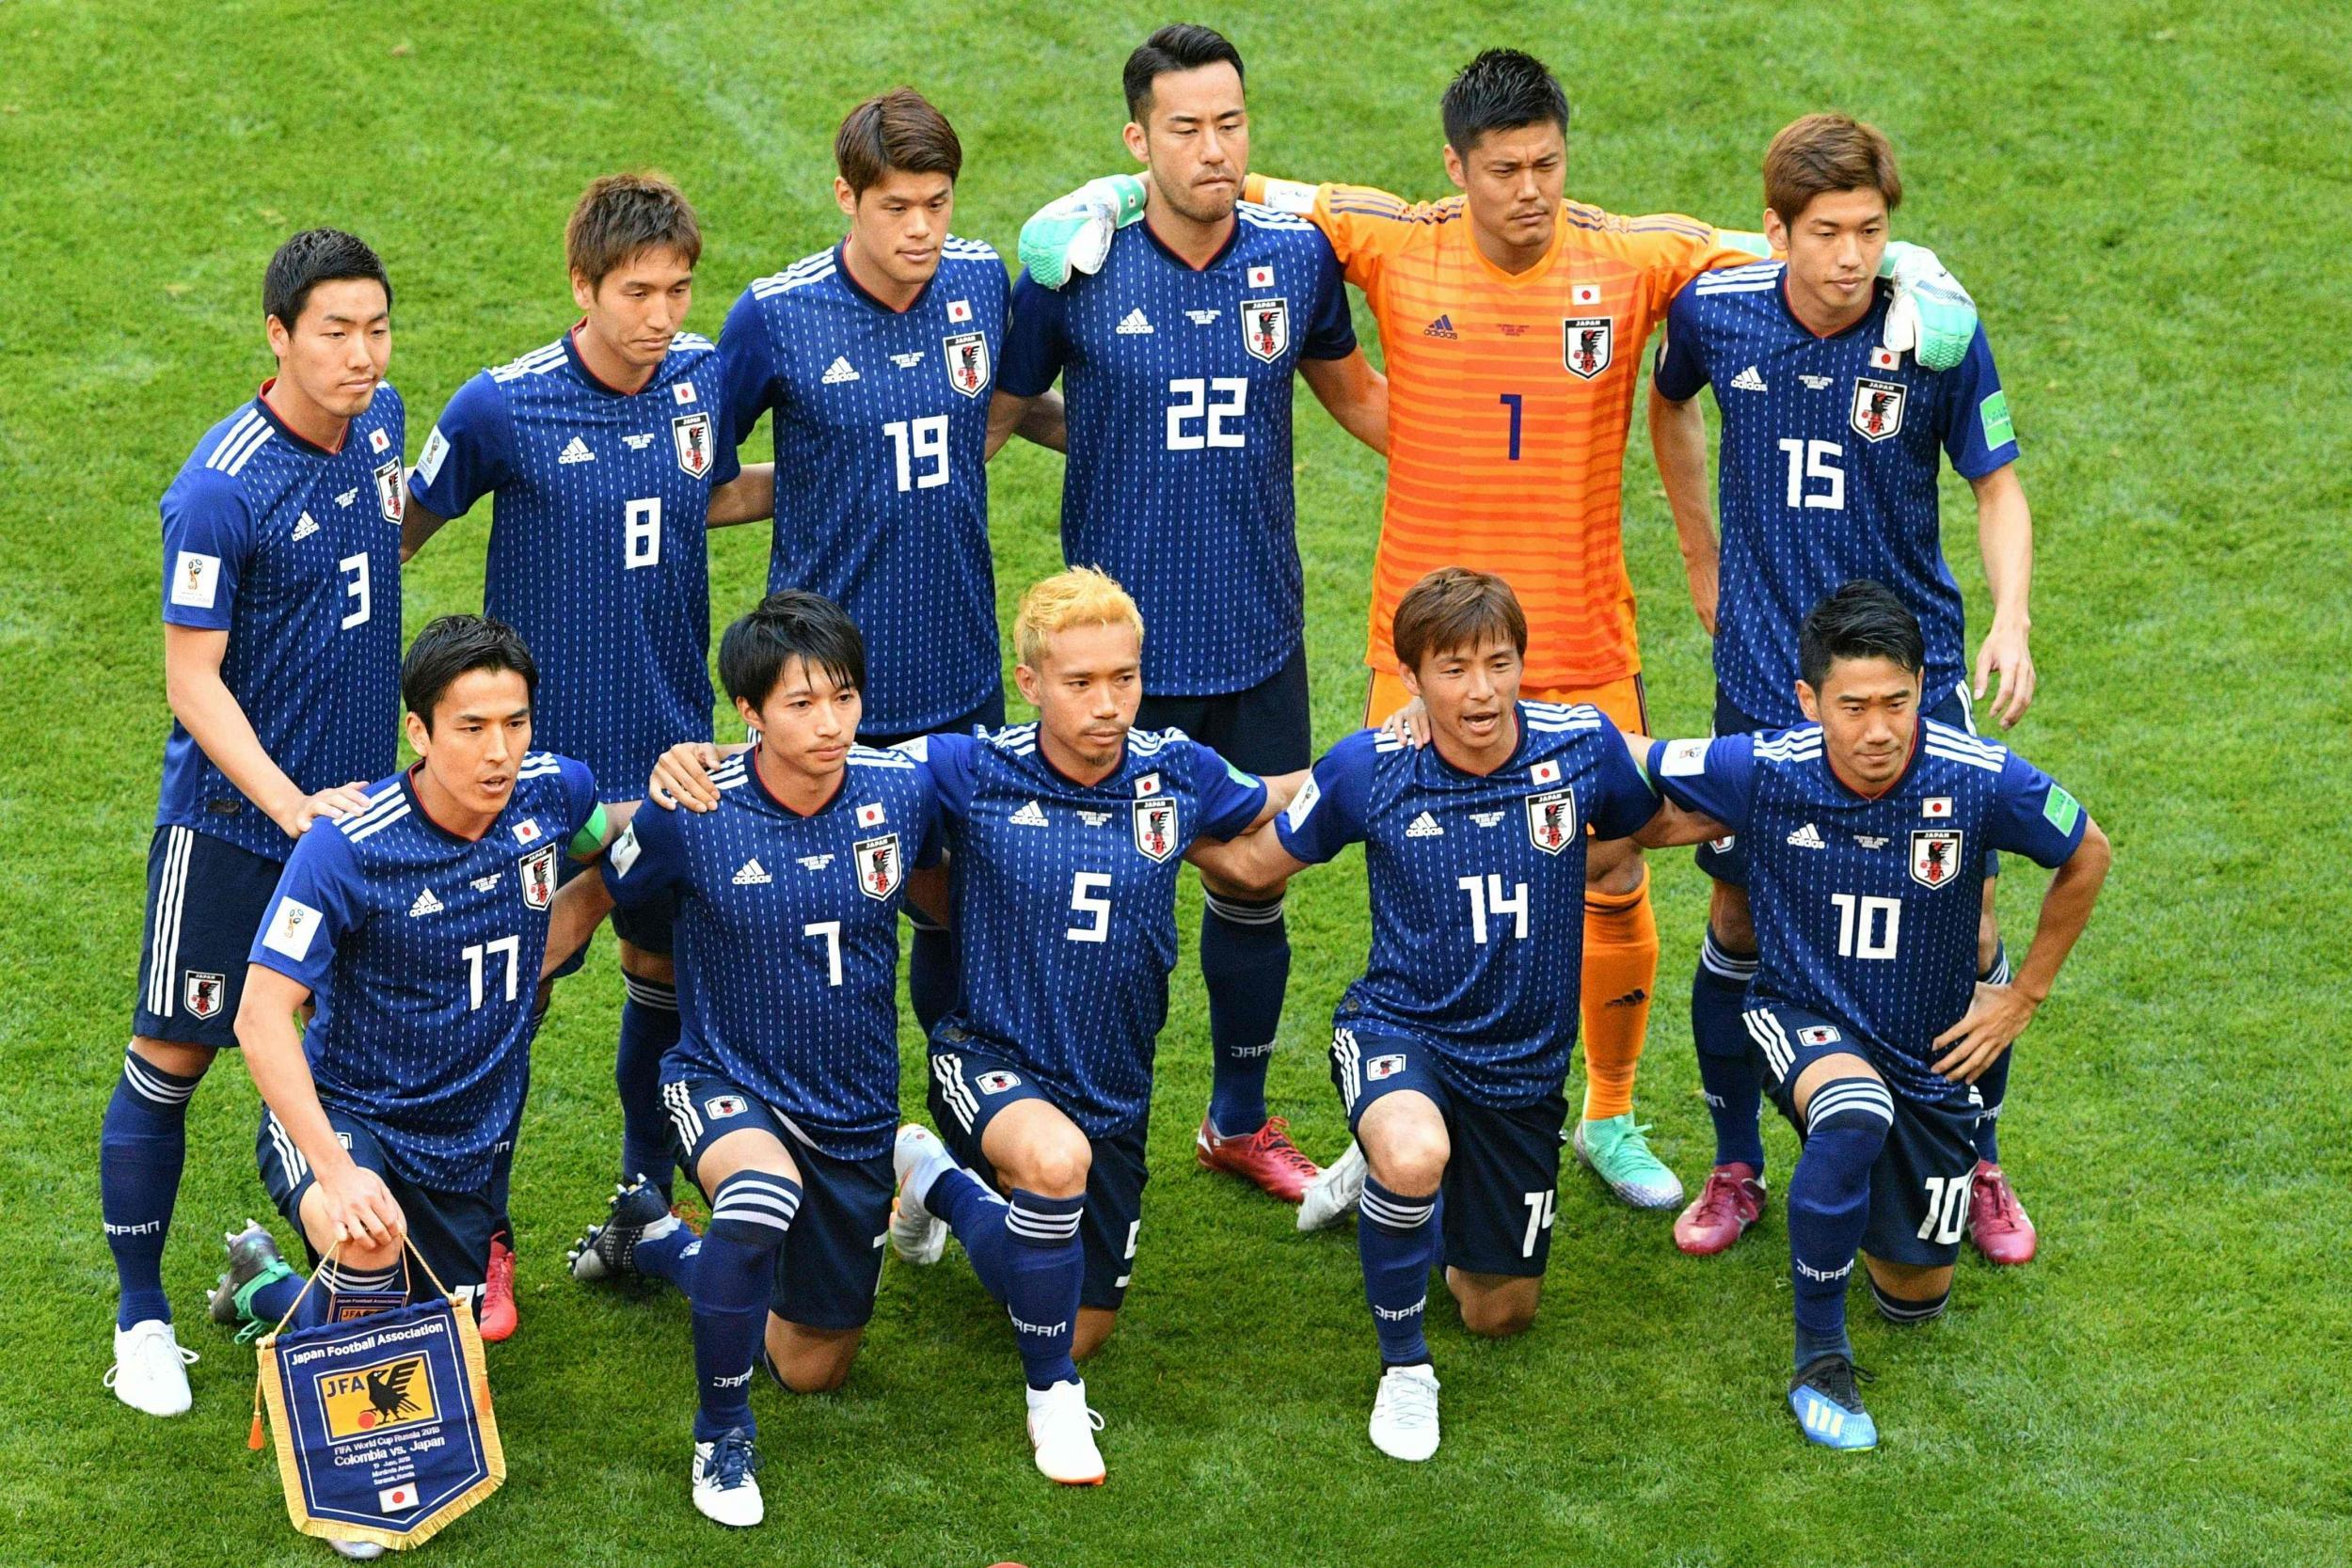 colombia vs japan - photo #12